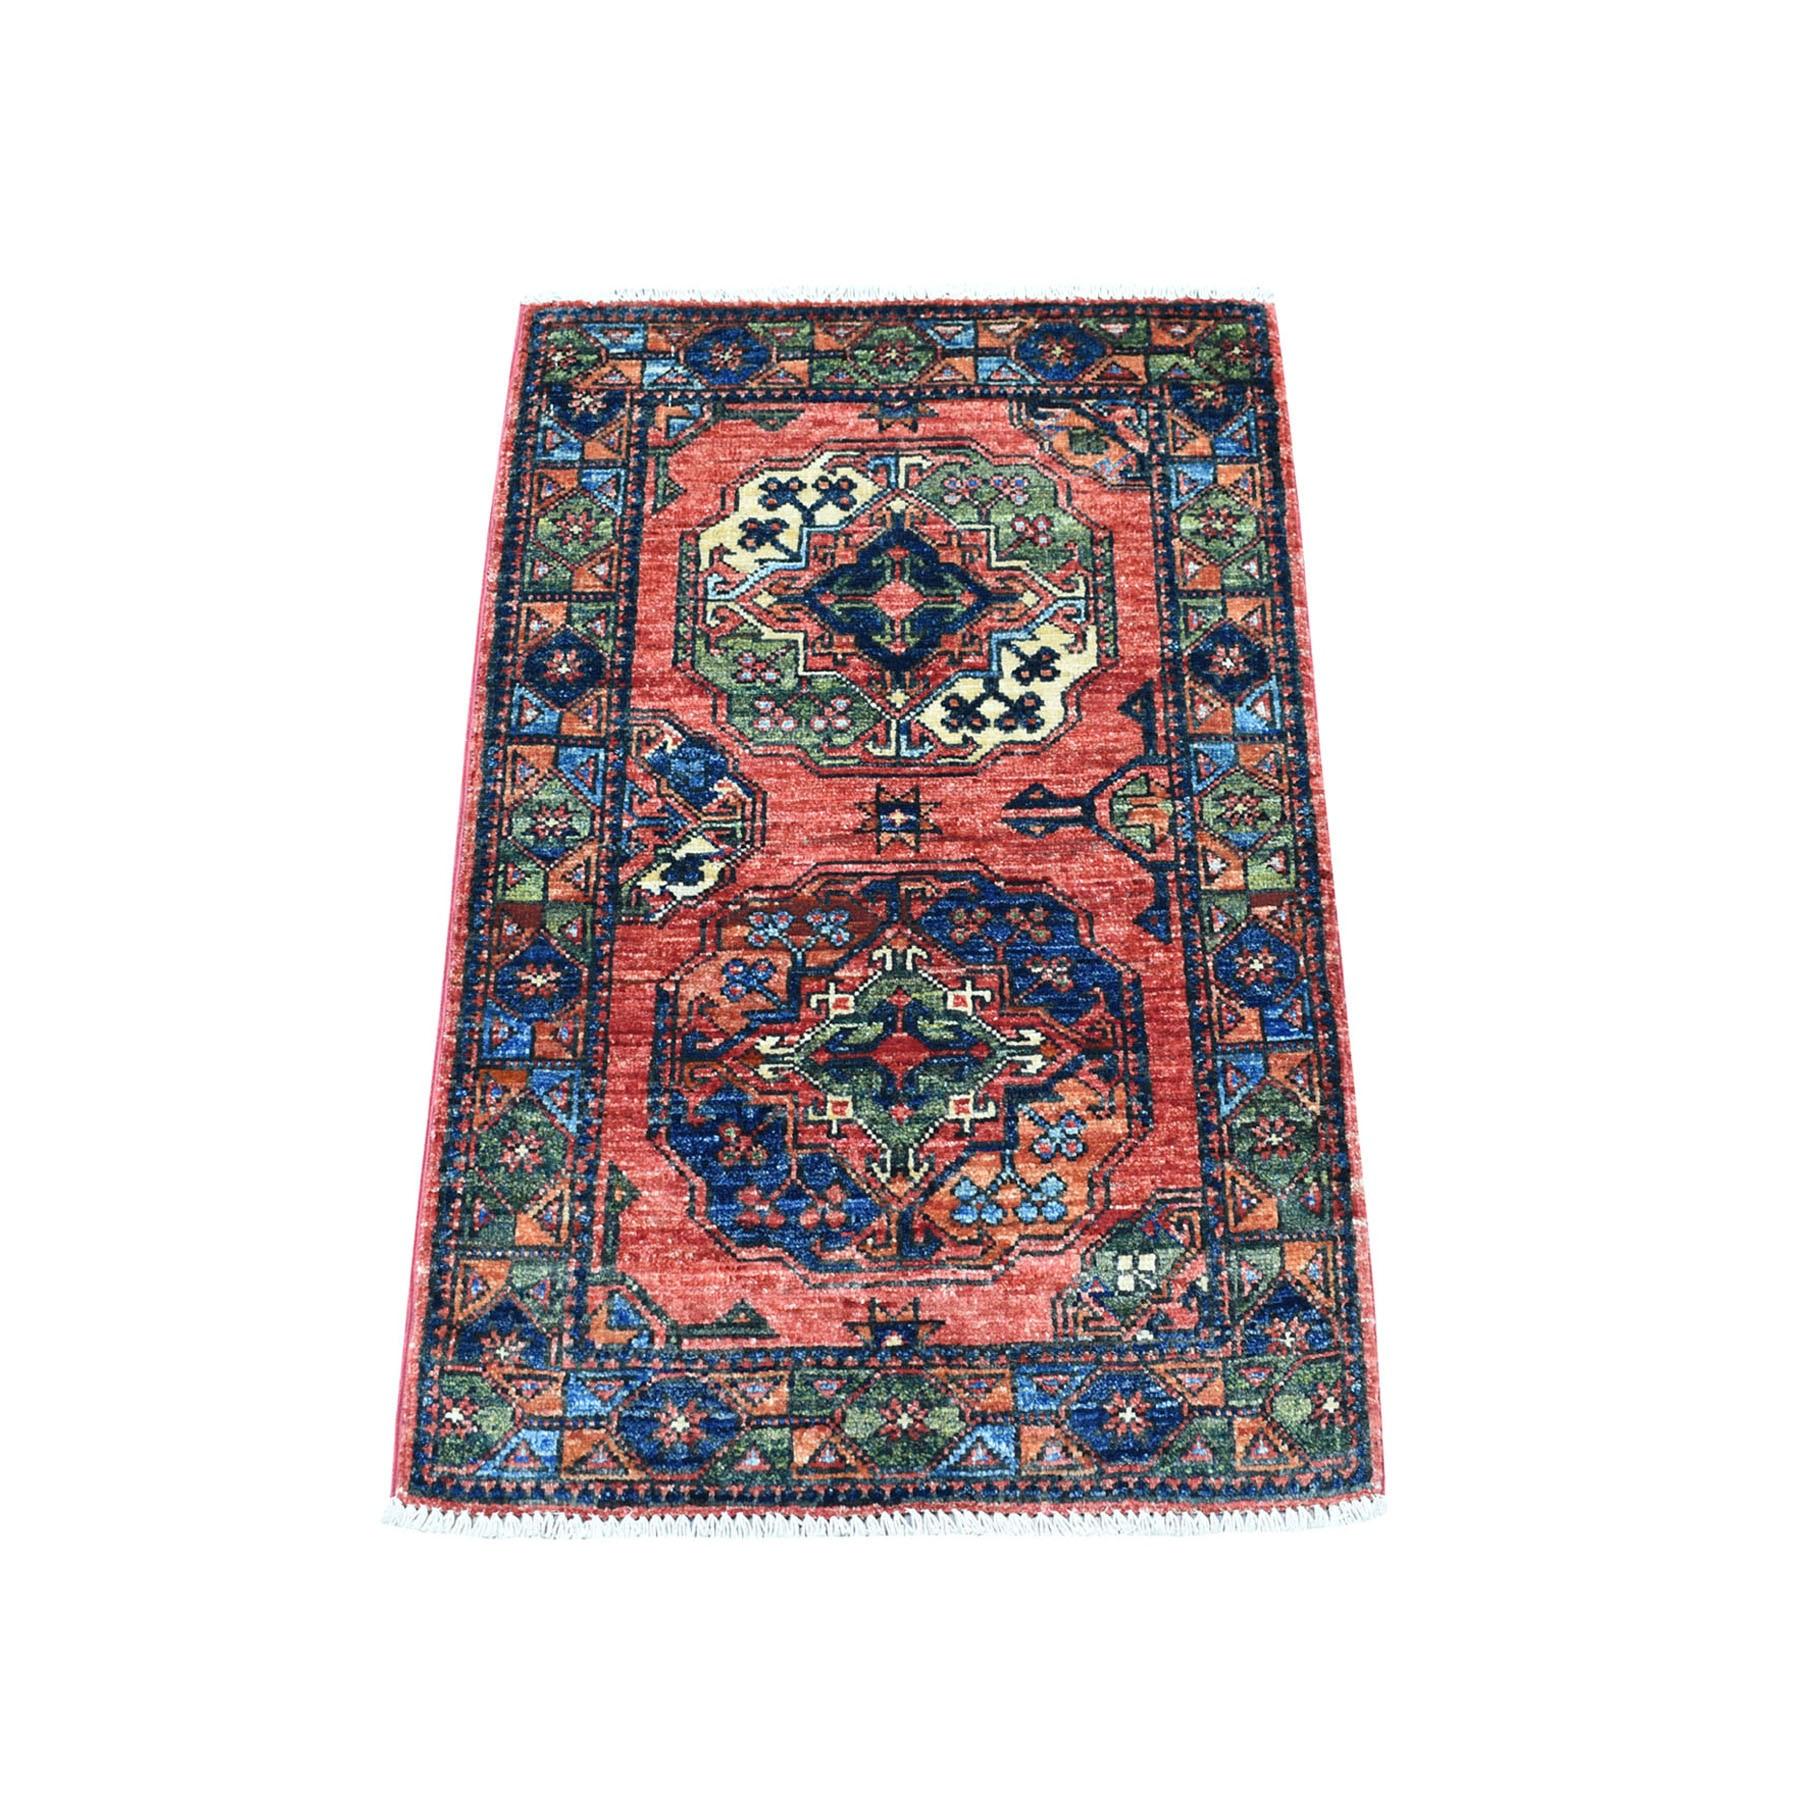 2'X3' Blue Elephant Feet Design Afghan Ersari Hand Knotted Pure Wool Oriental Rug moaecbb8